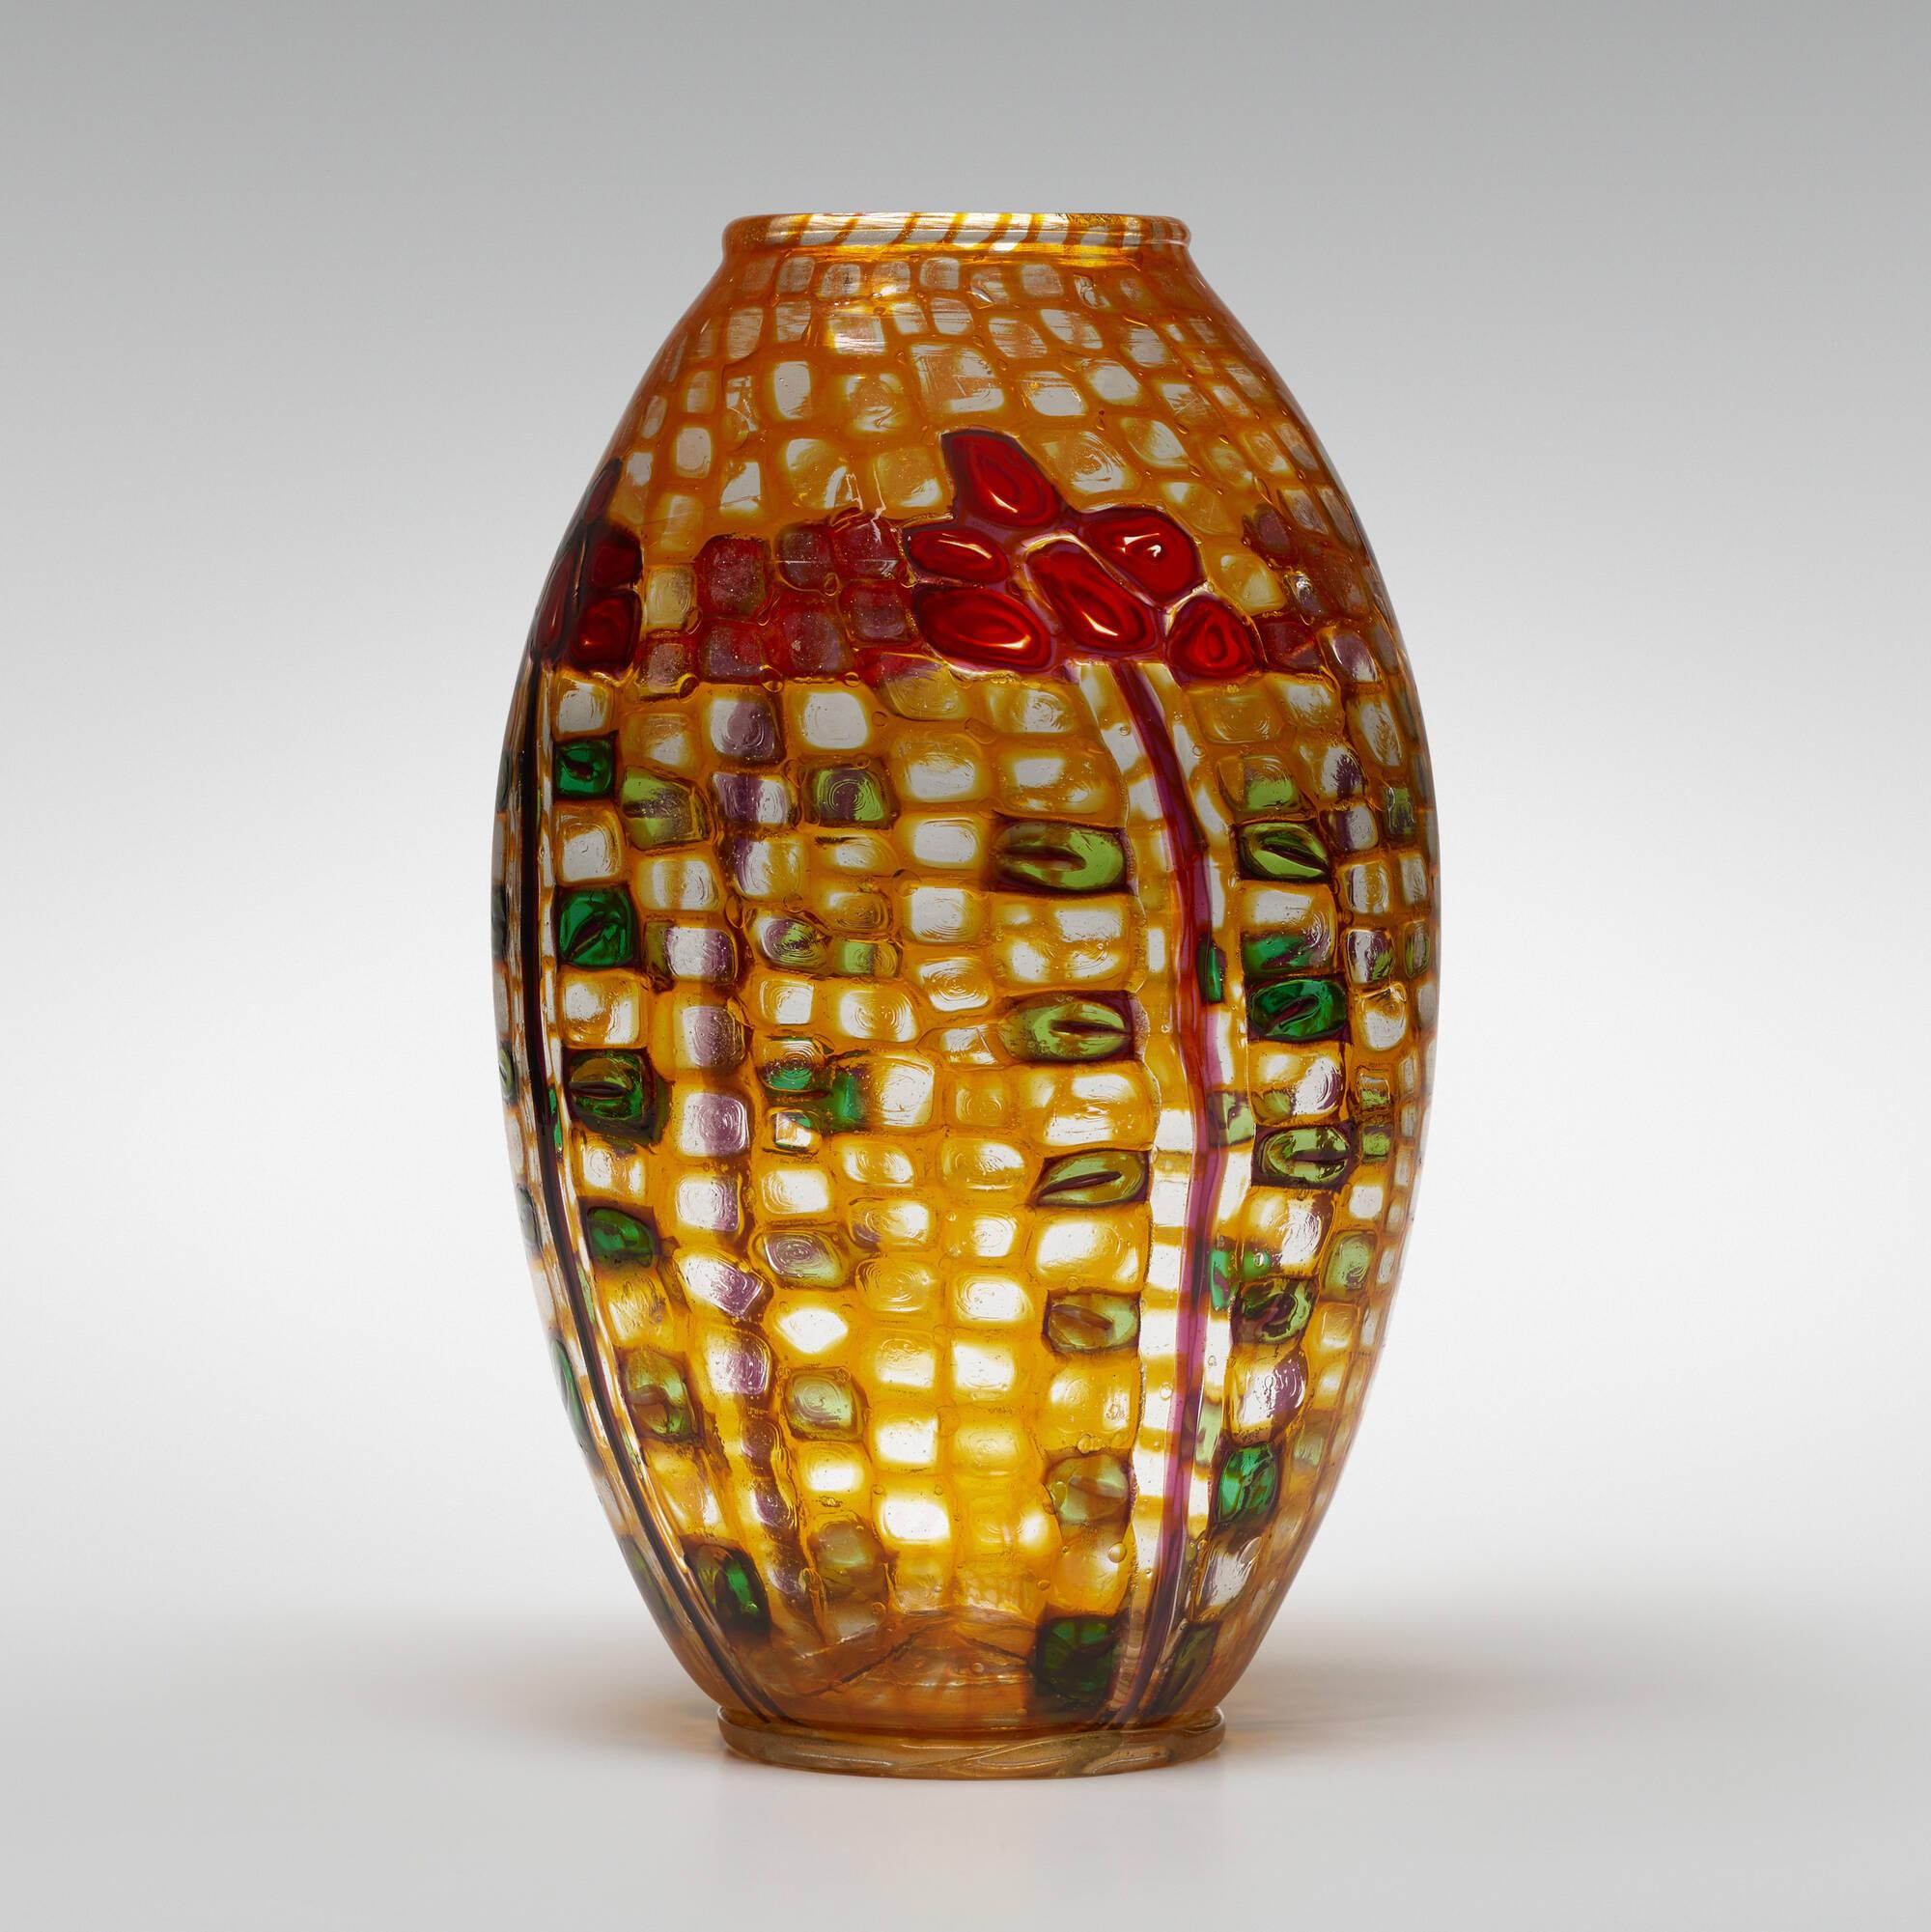 34: Ercole Barovier / Important Mosaico vase (1 of 4)